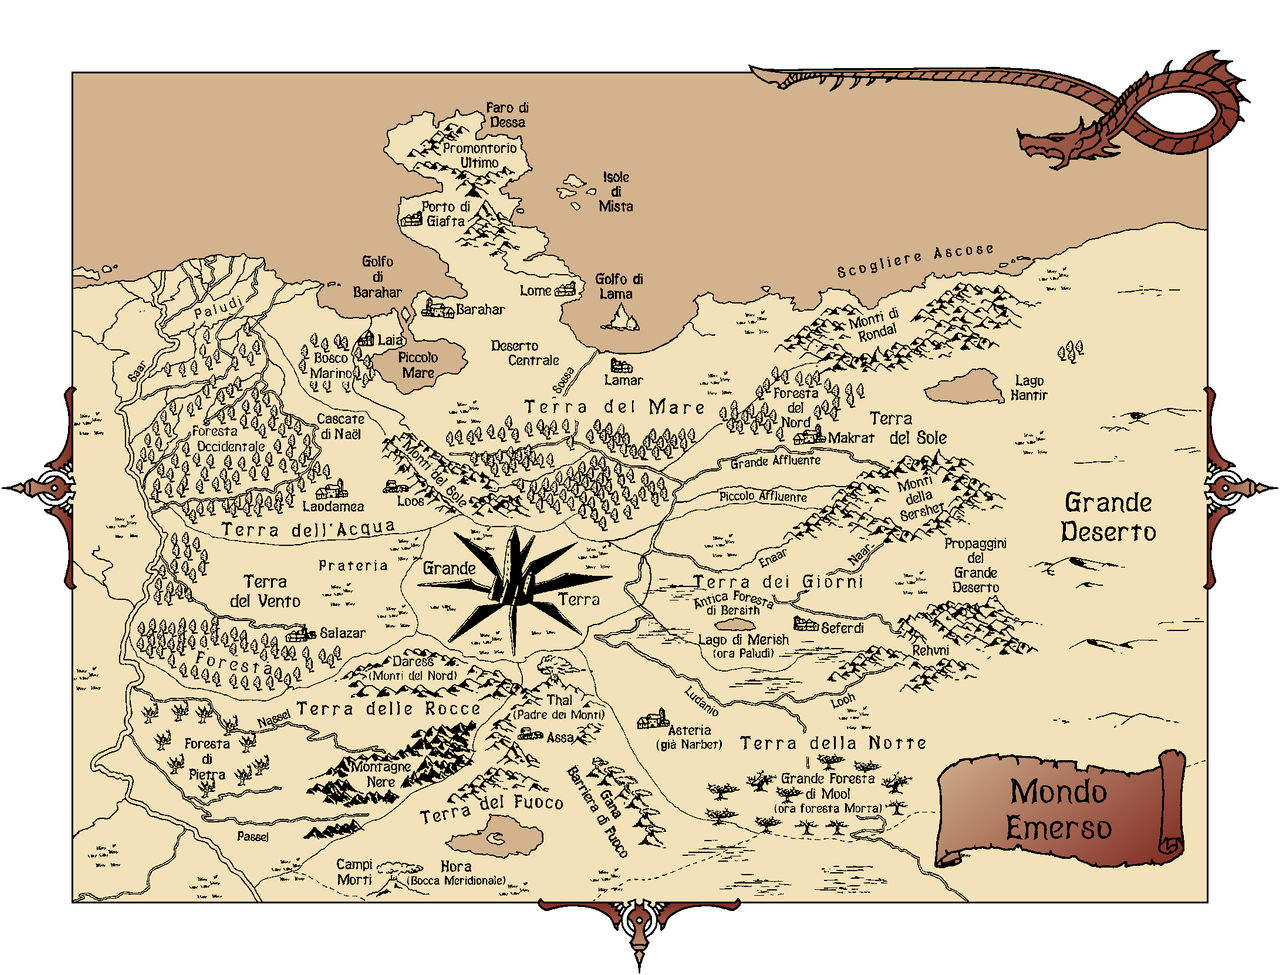 Cartina Mondo Emerso.Mappa Cronache Mondo Emerso By Ok Billy On Deviantart